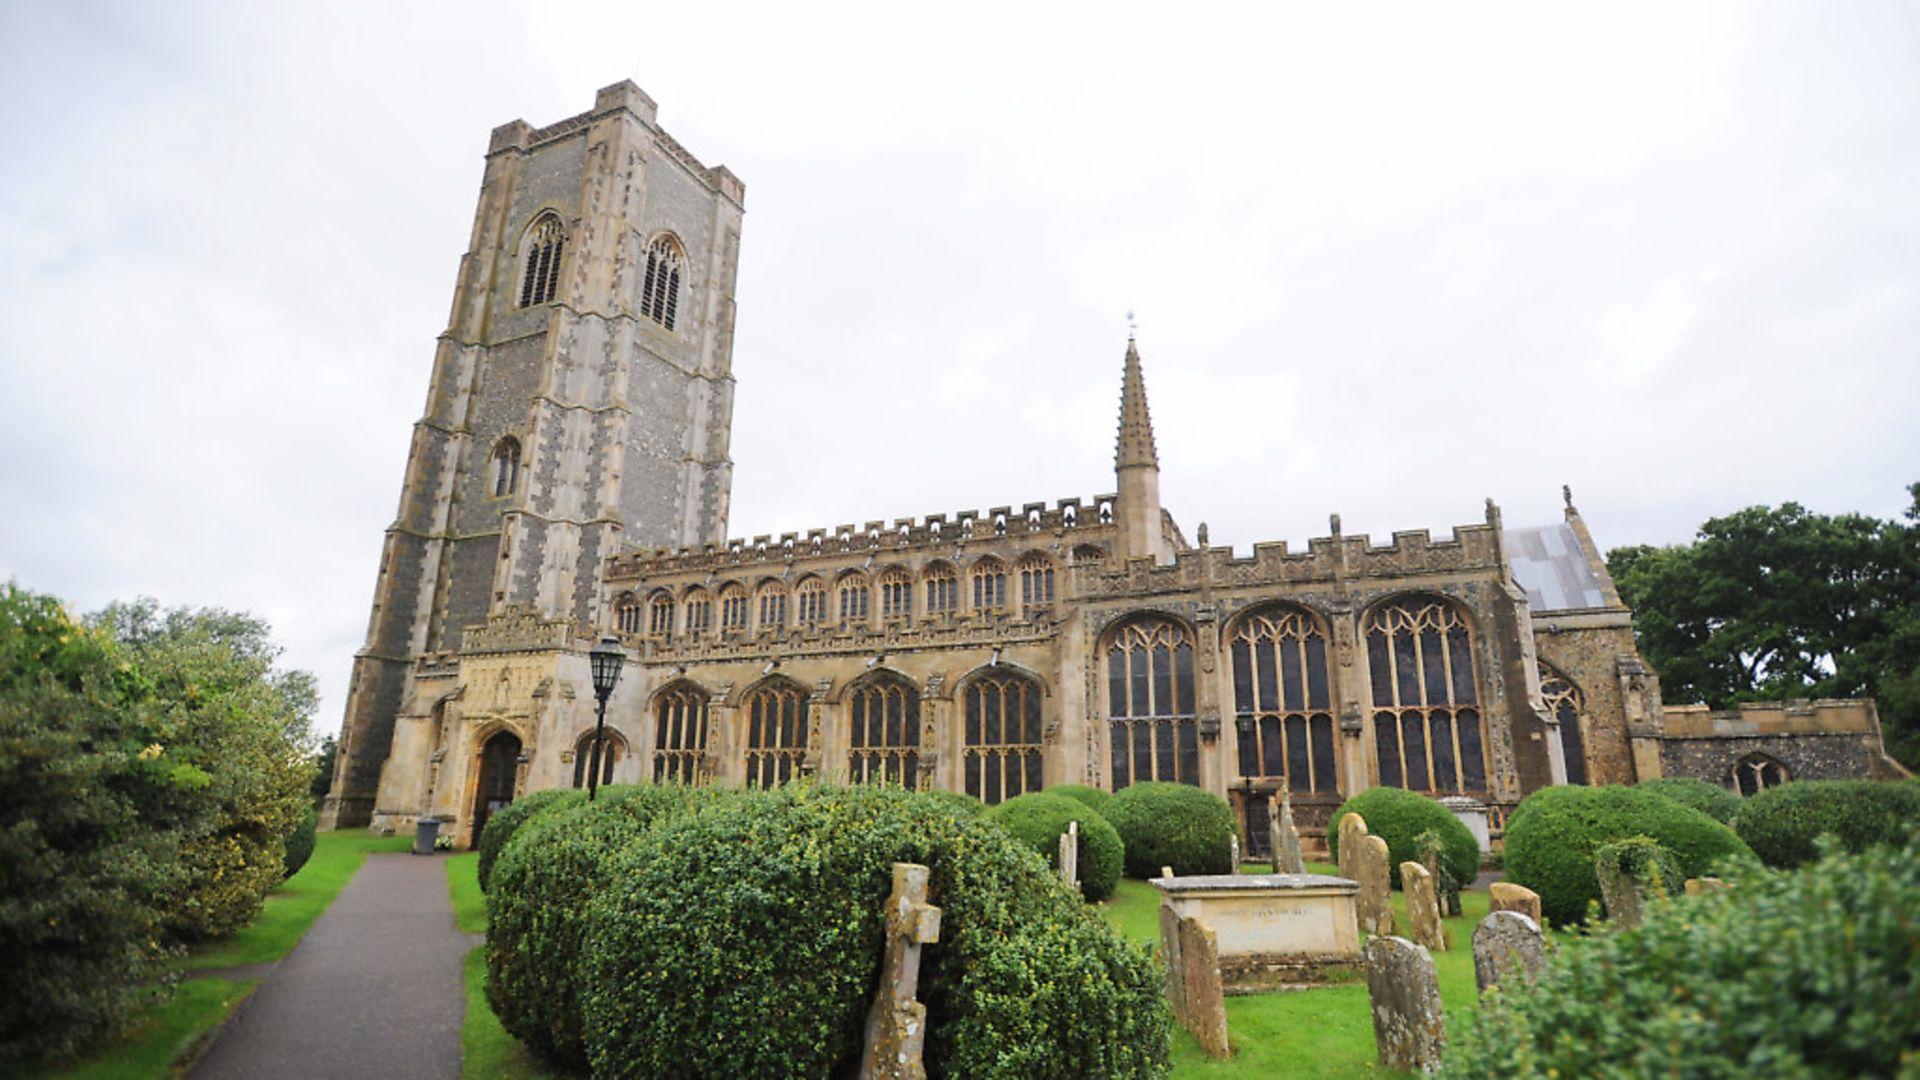 Lavenham church in Suffolk. East Anglia returns in Peter Trudgill's latest column. Photograph: Gregg Brown - Credit: Gregg Brown